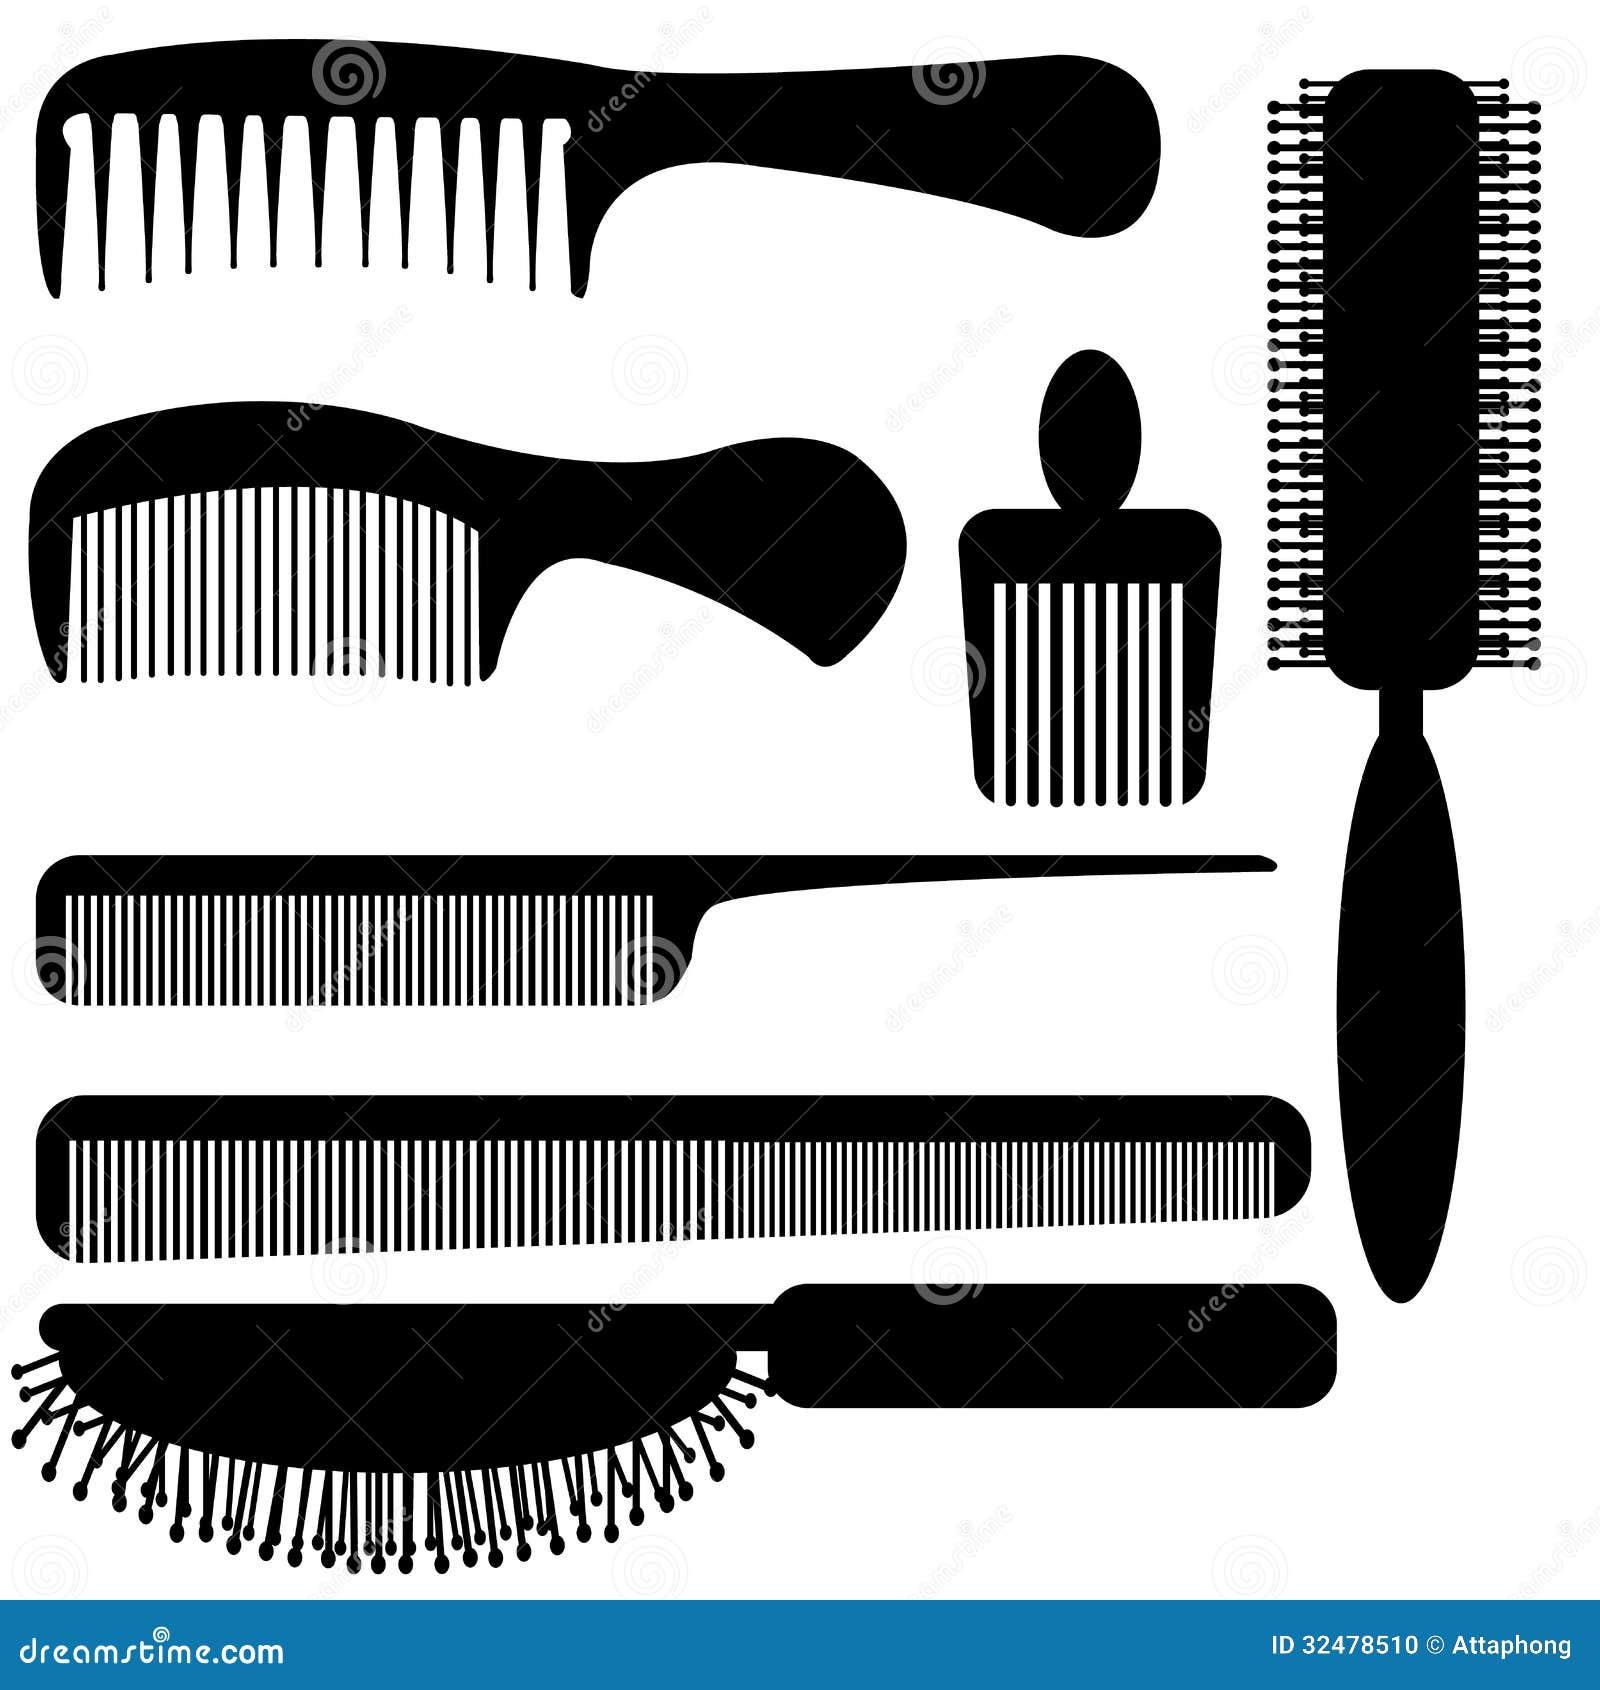 Comb hair clipart